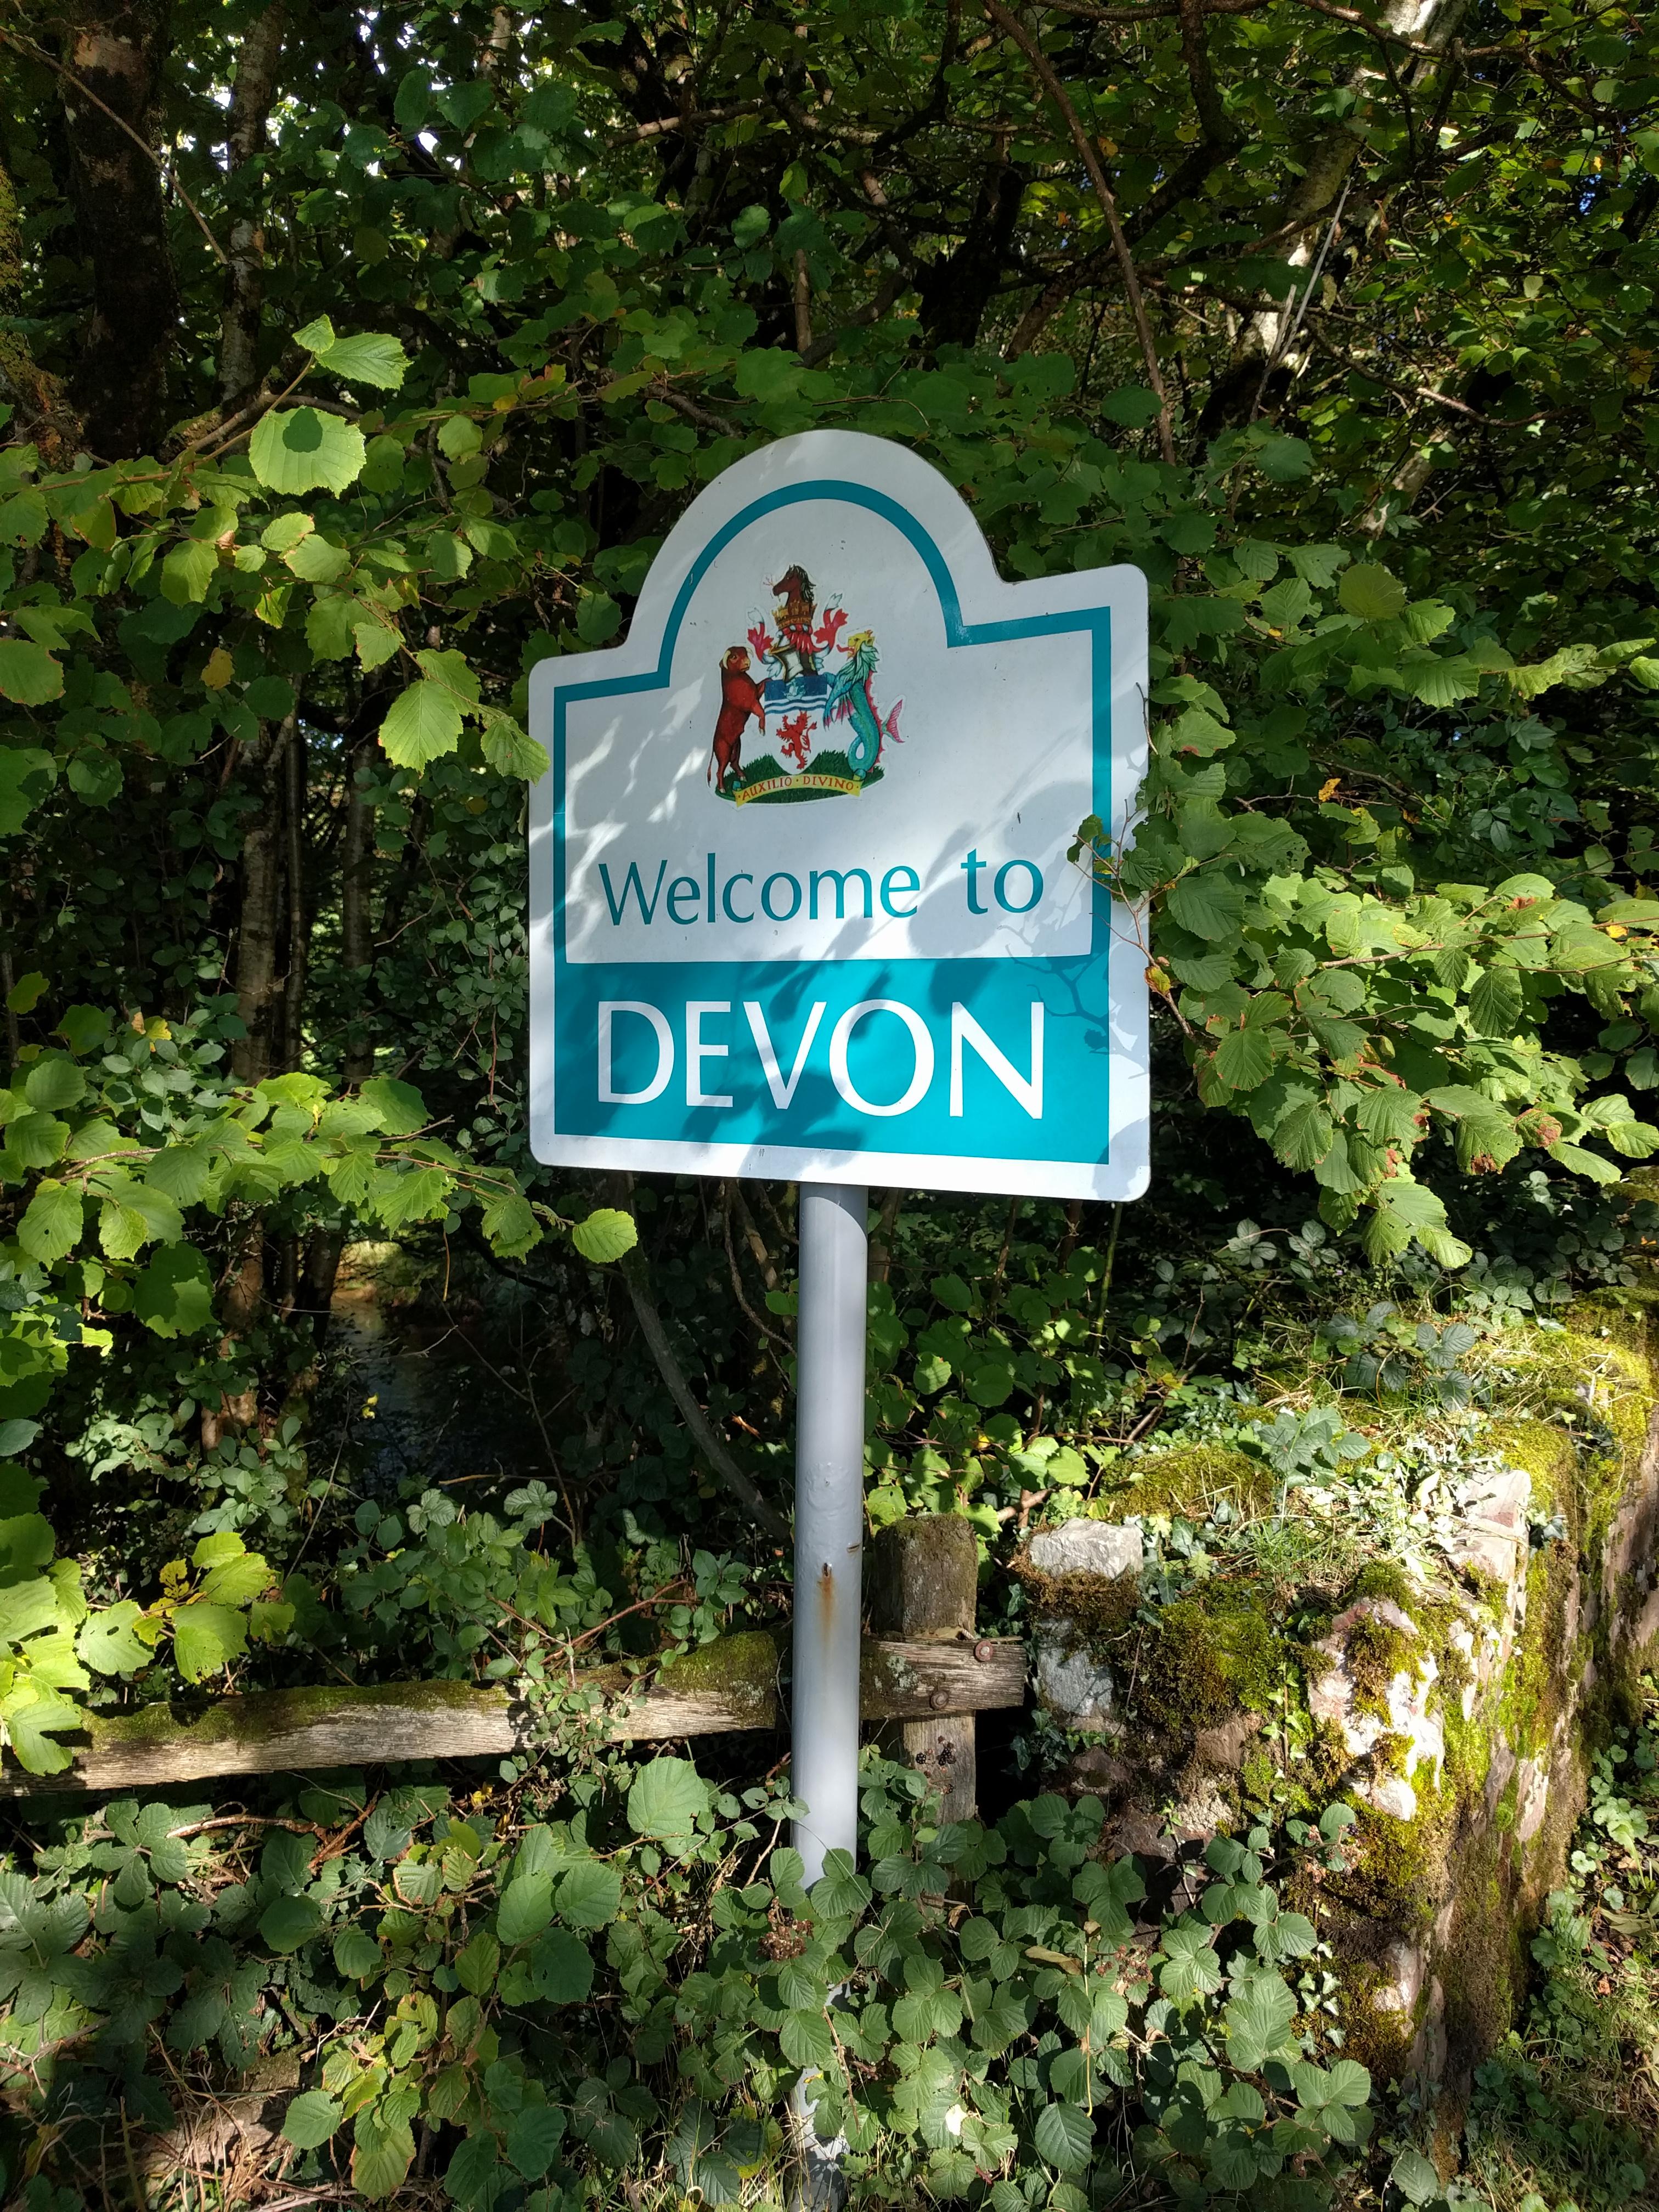 Back in Devon #sh #twomoorsway #DevonC2C